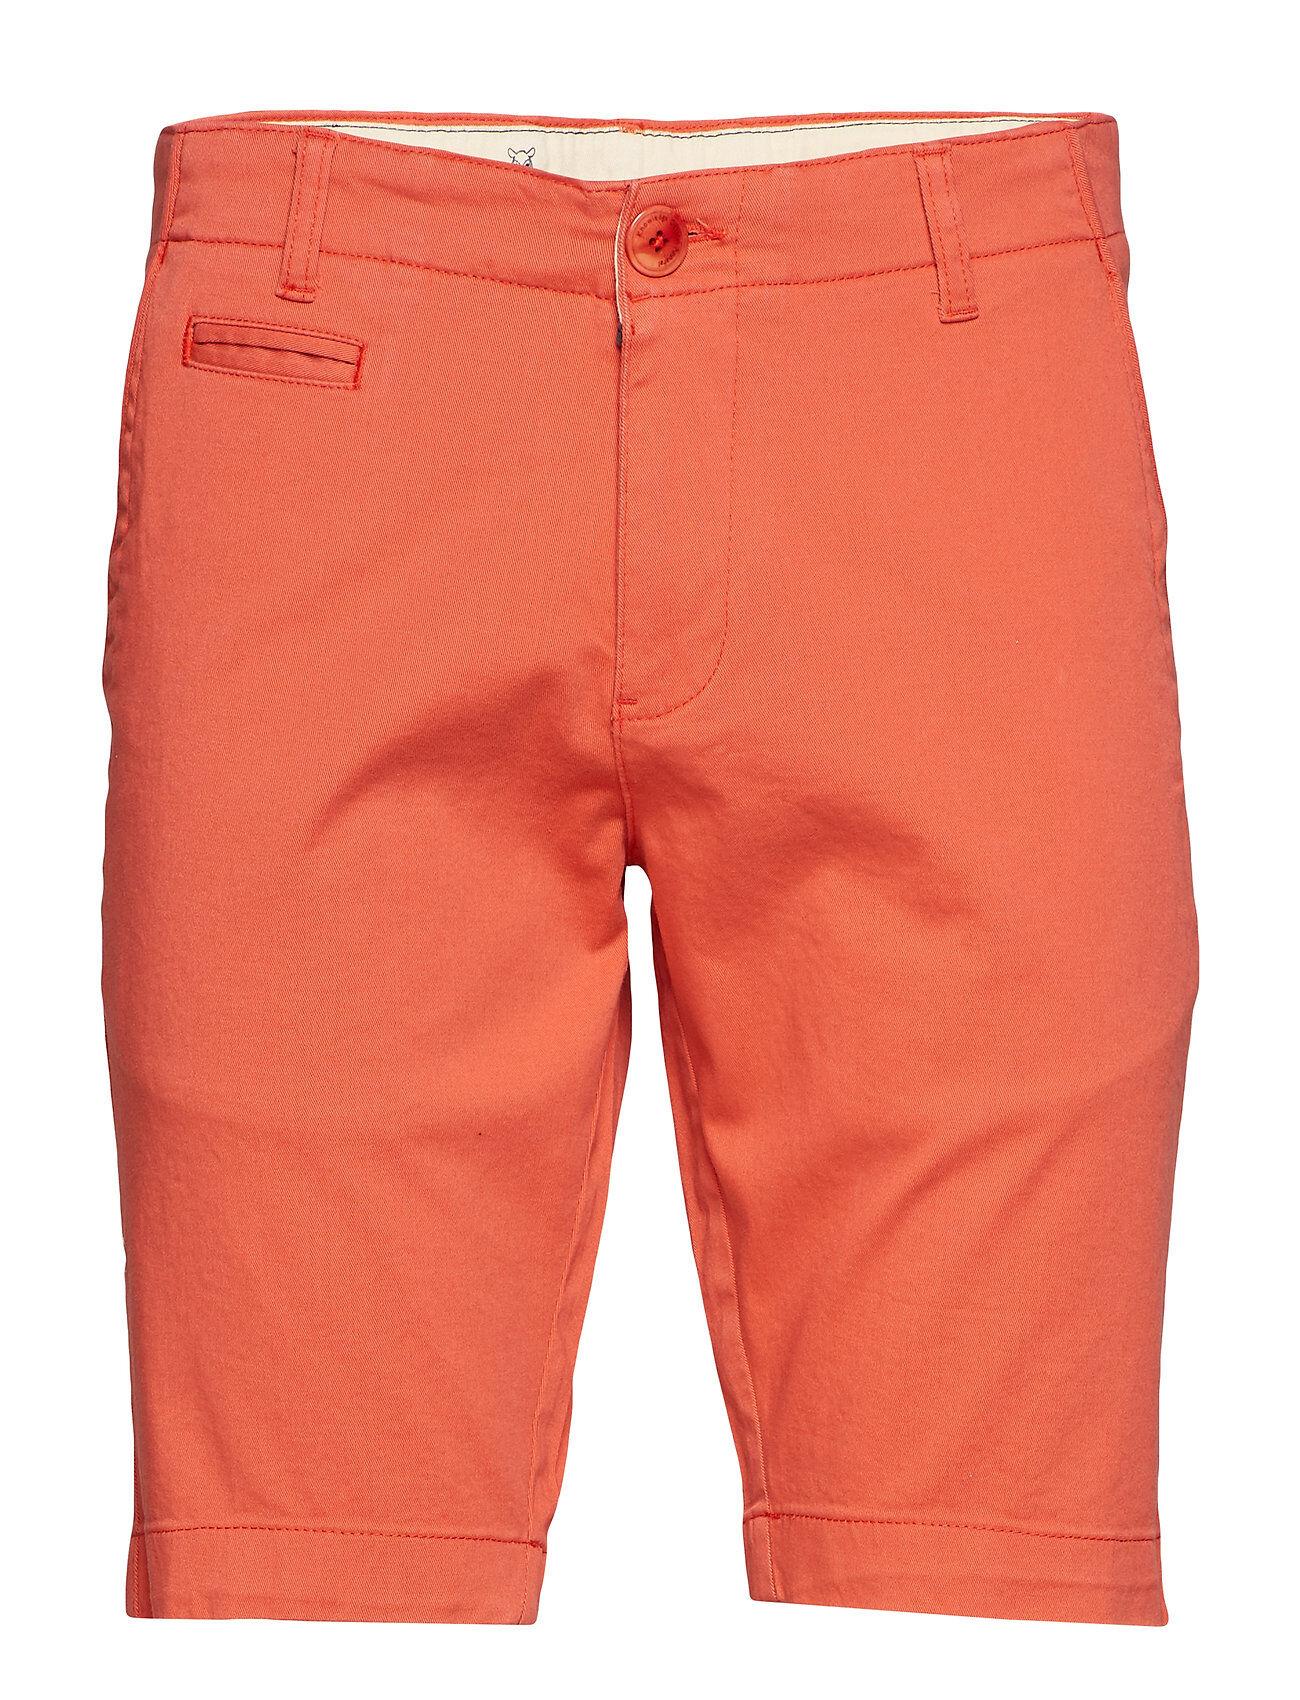 Knowledge Cotton Apparel Stretch Chino Shorts - Gots/Vegan